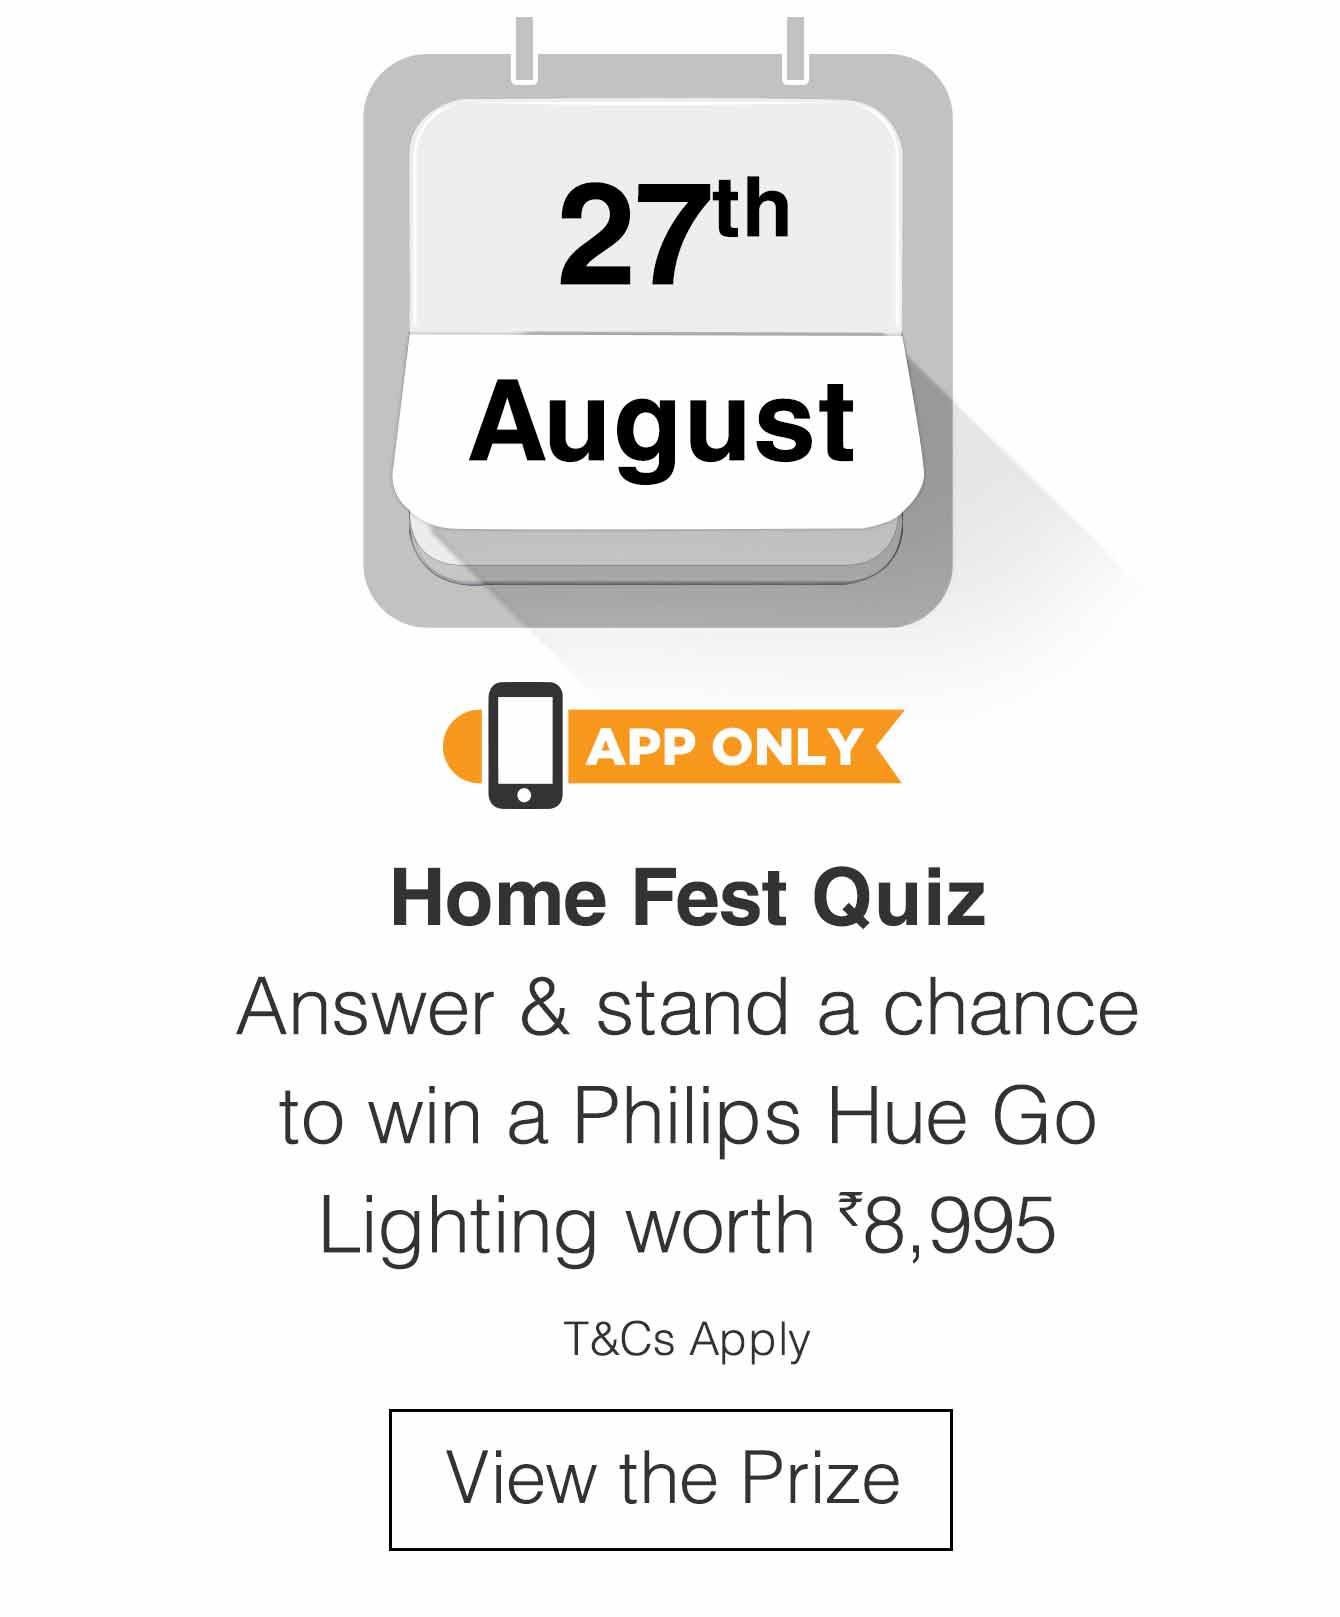 Home Fest Quiz